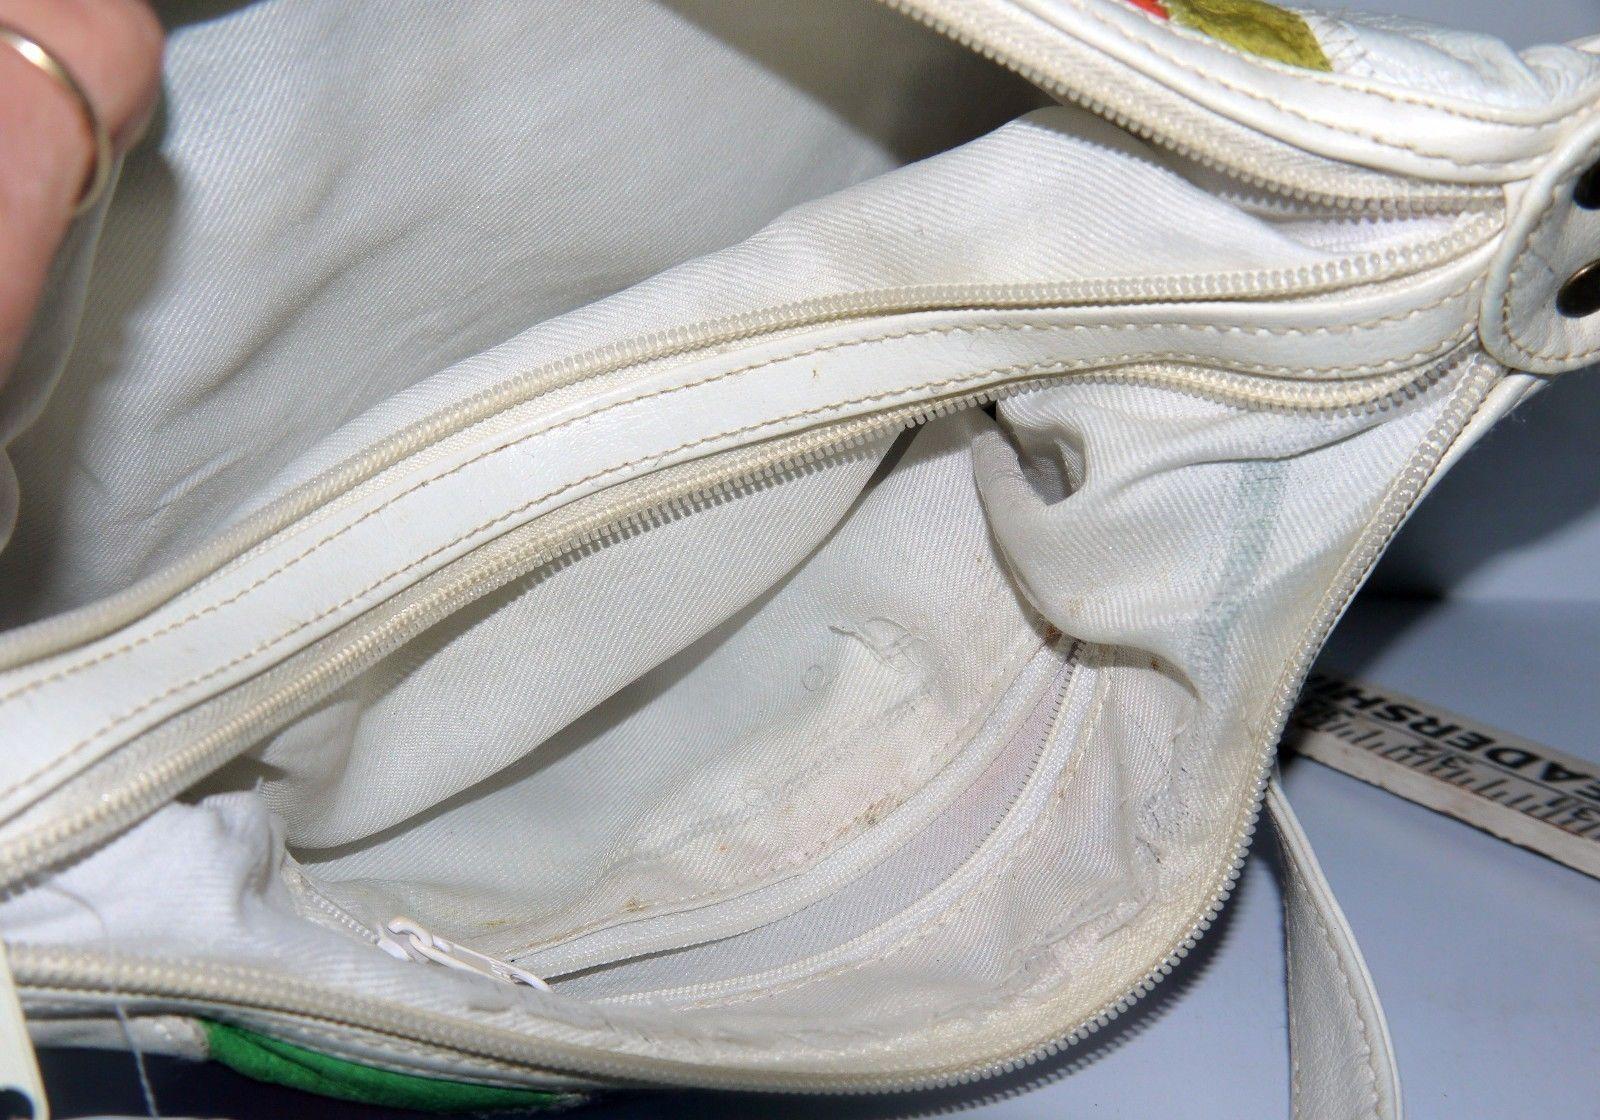 Ladies White Vinyl Zippered Shoulder Handbag w/Multi-Colored Patchwork Design